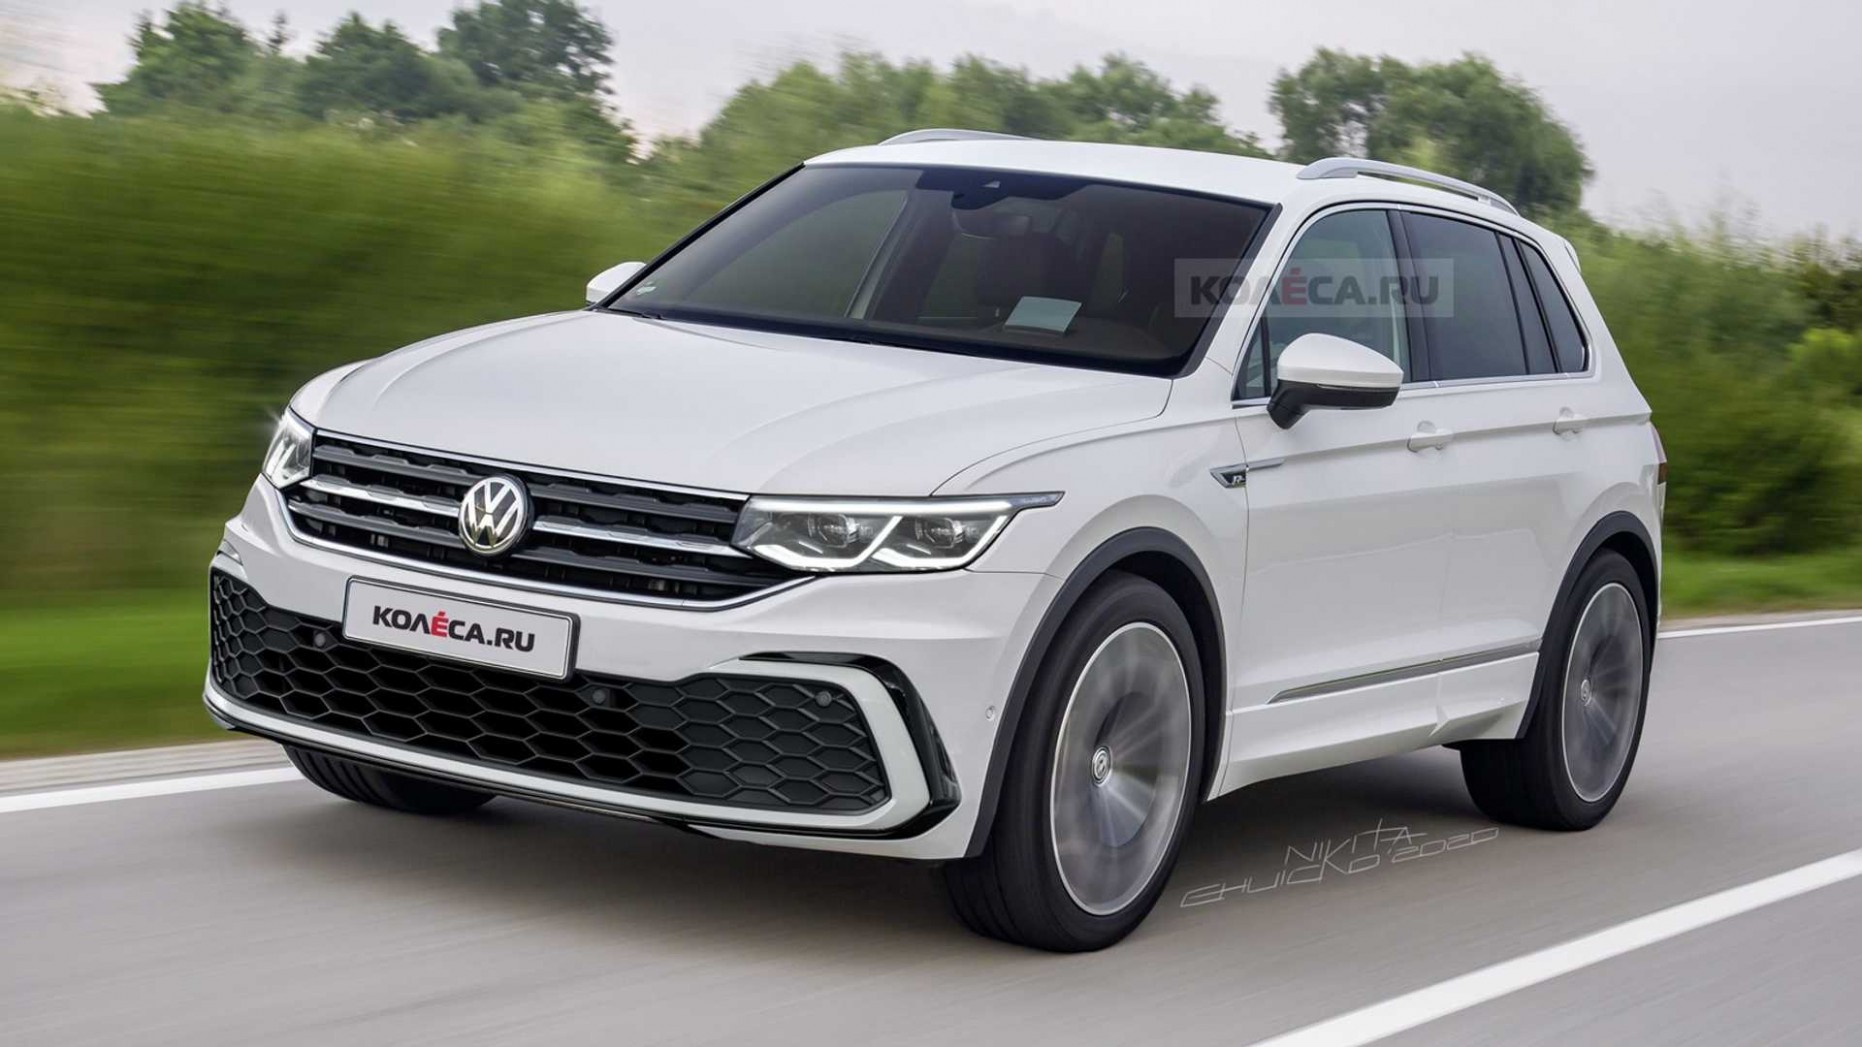 New And Refreshed 4 Volkswagen Tiguan Spied! - Volkswagen Suv 2021